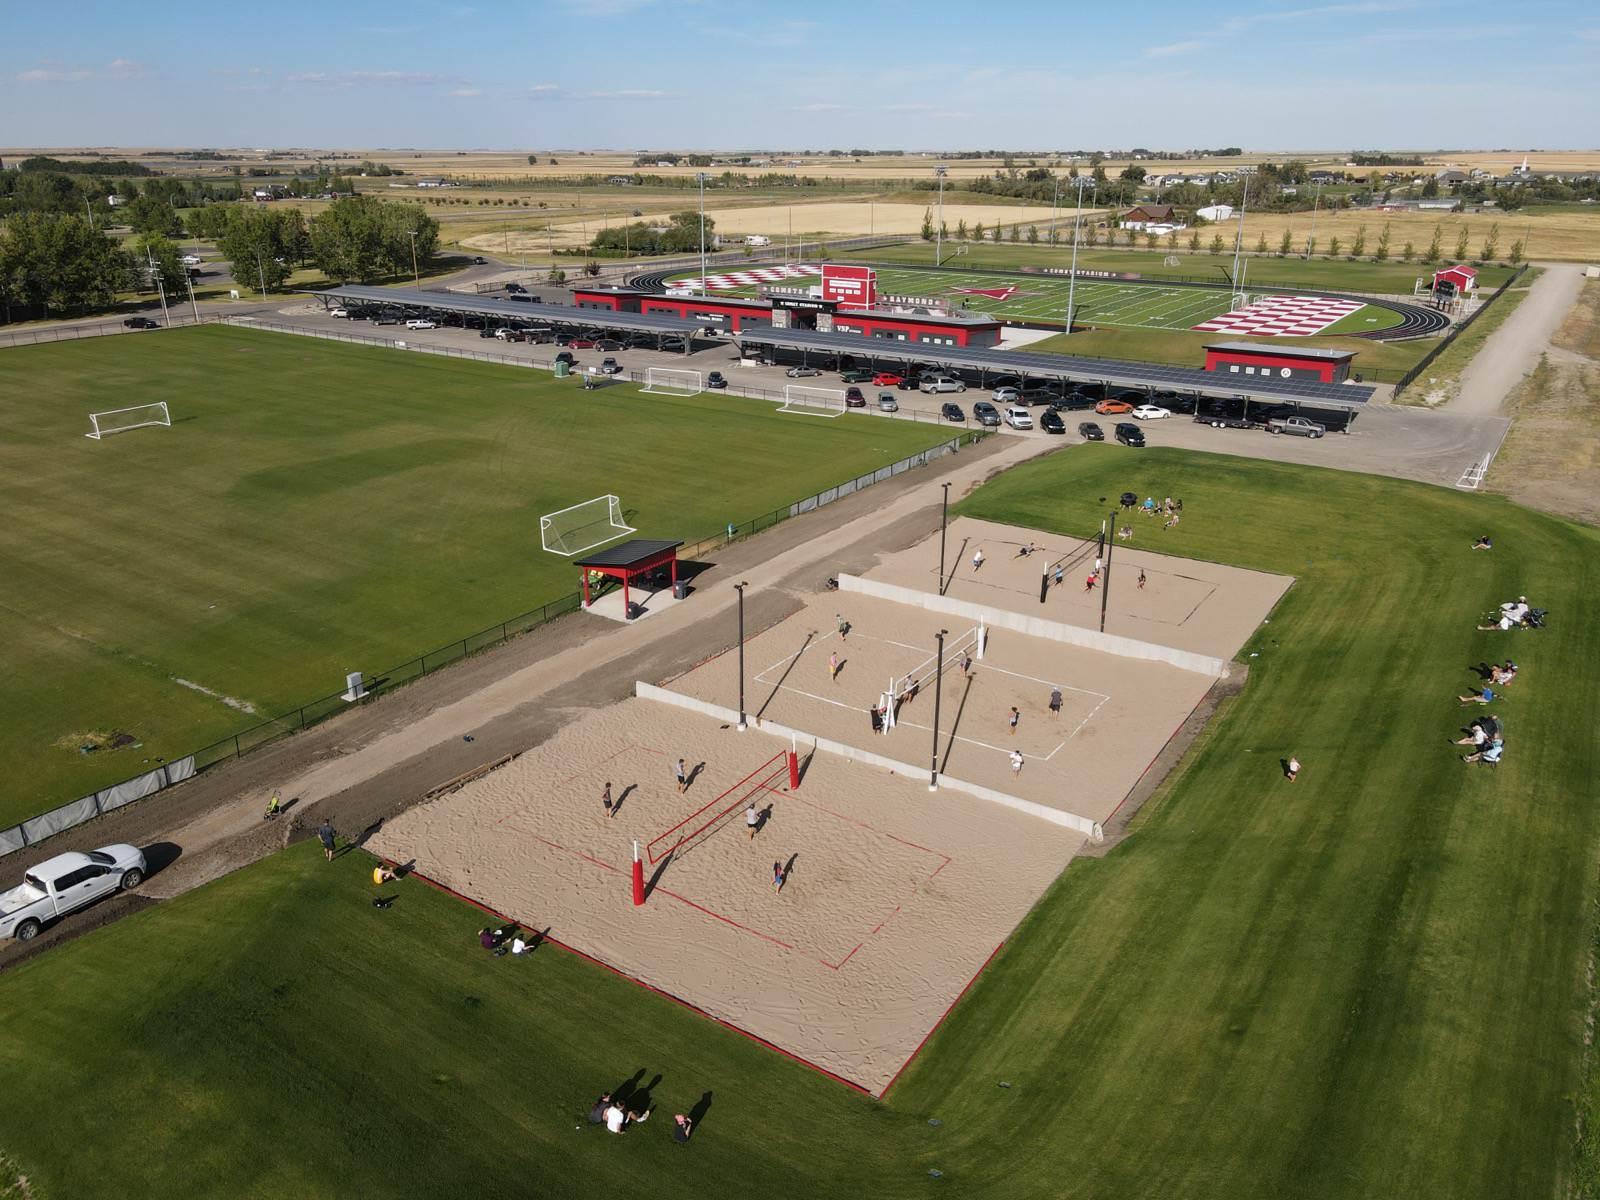 Beach Volleyball at Victoria Sport's Park